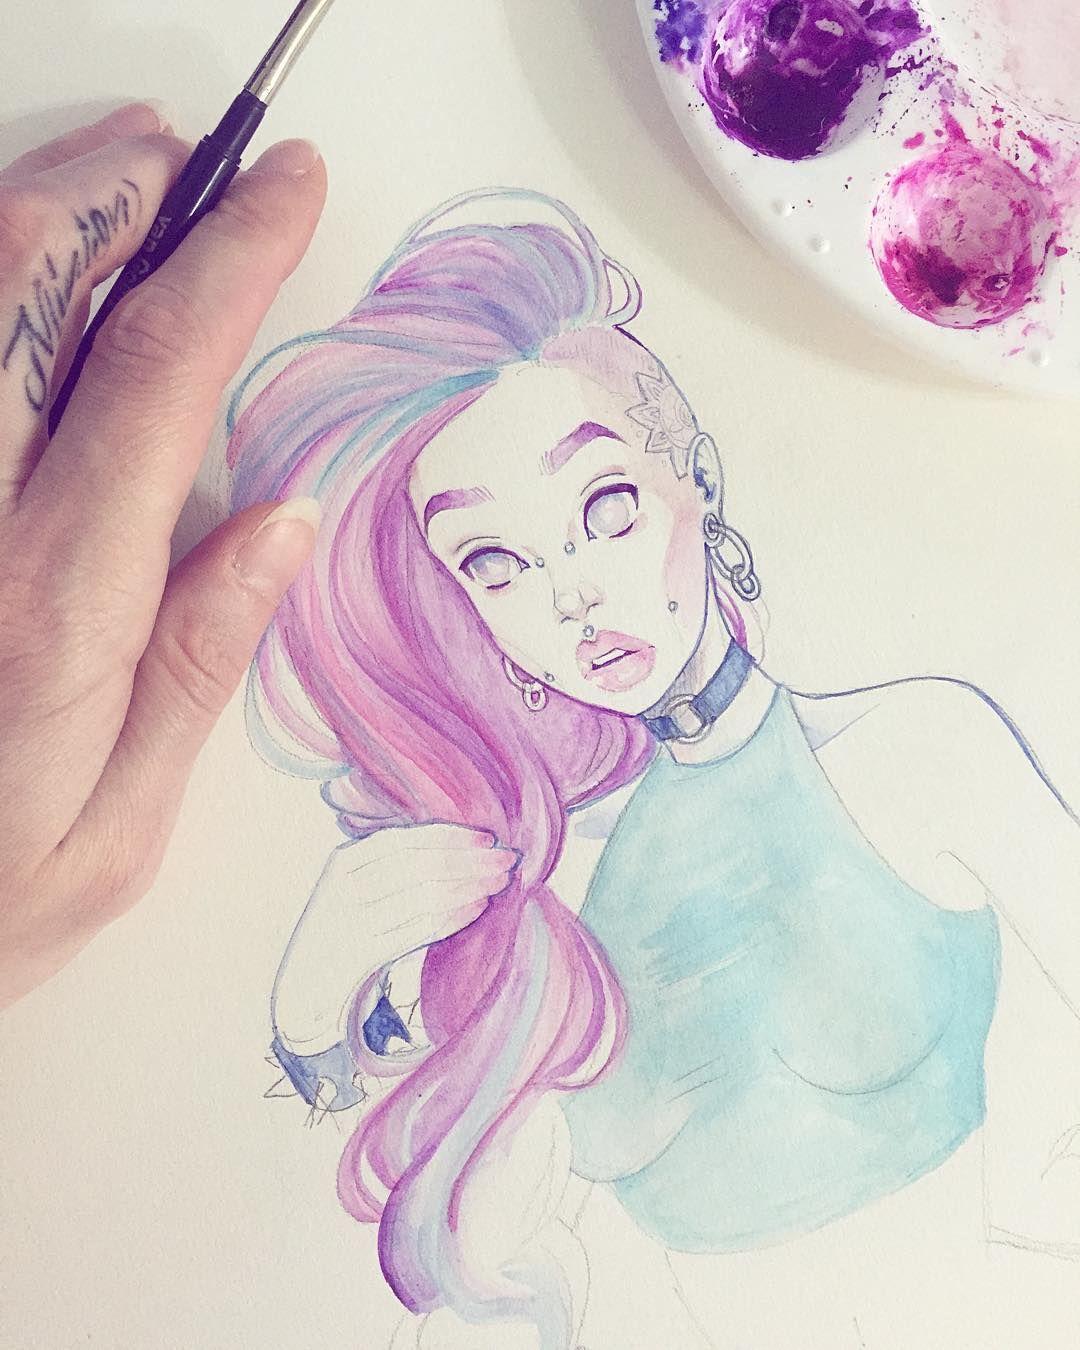 Sunday #watercolor action  #wip #manga #graphicartery #artshare #artwork…